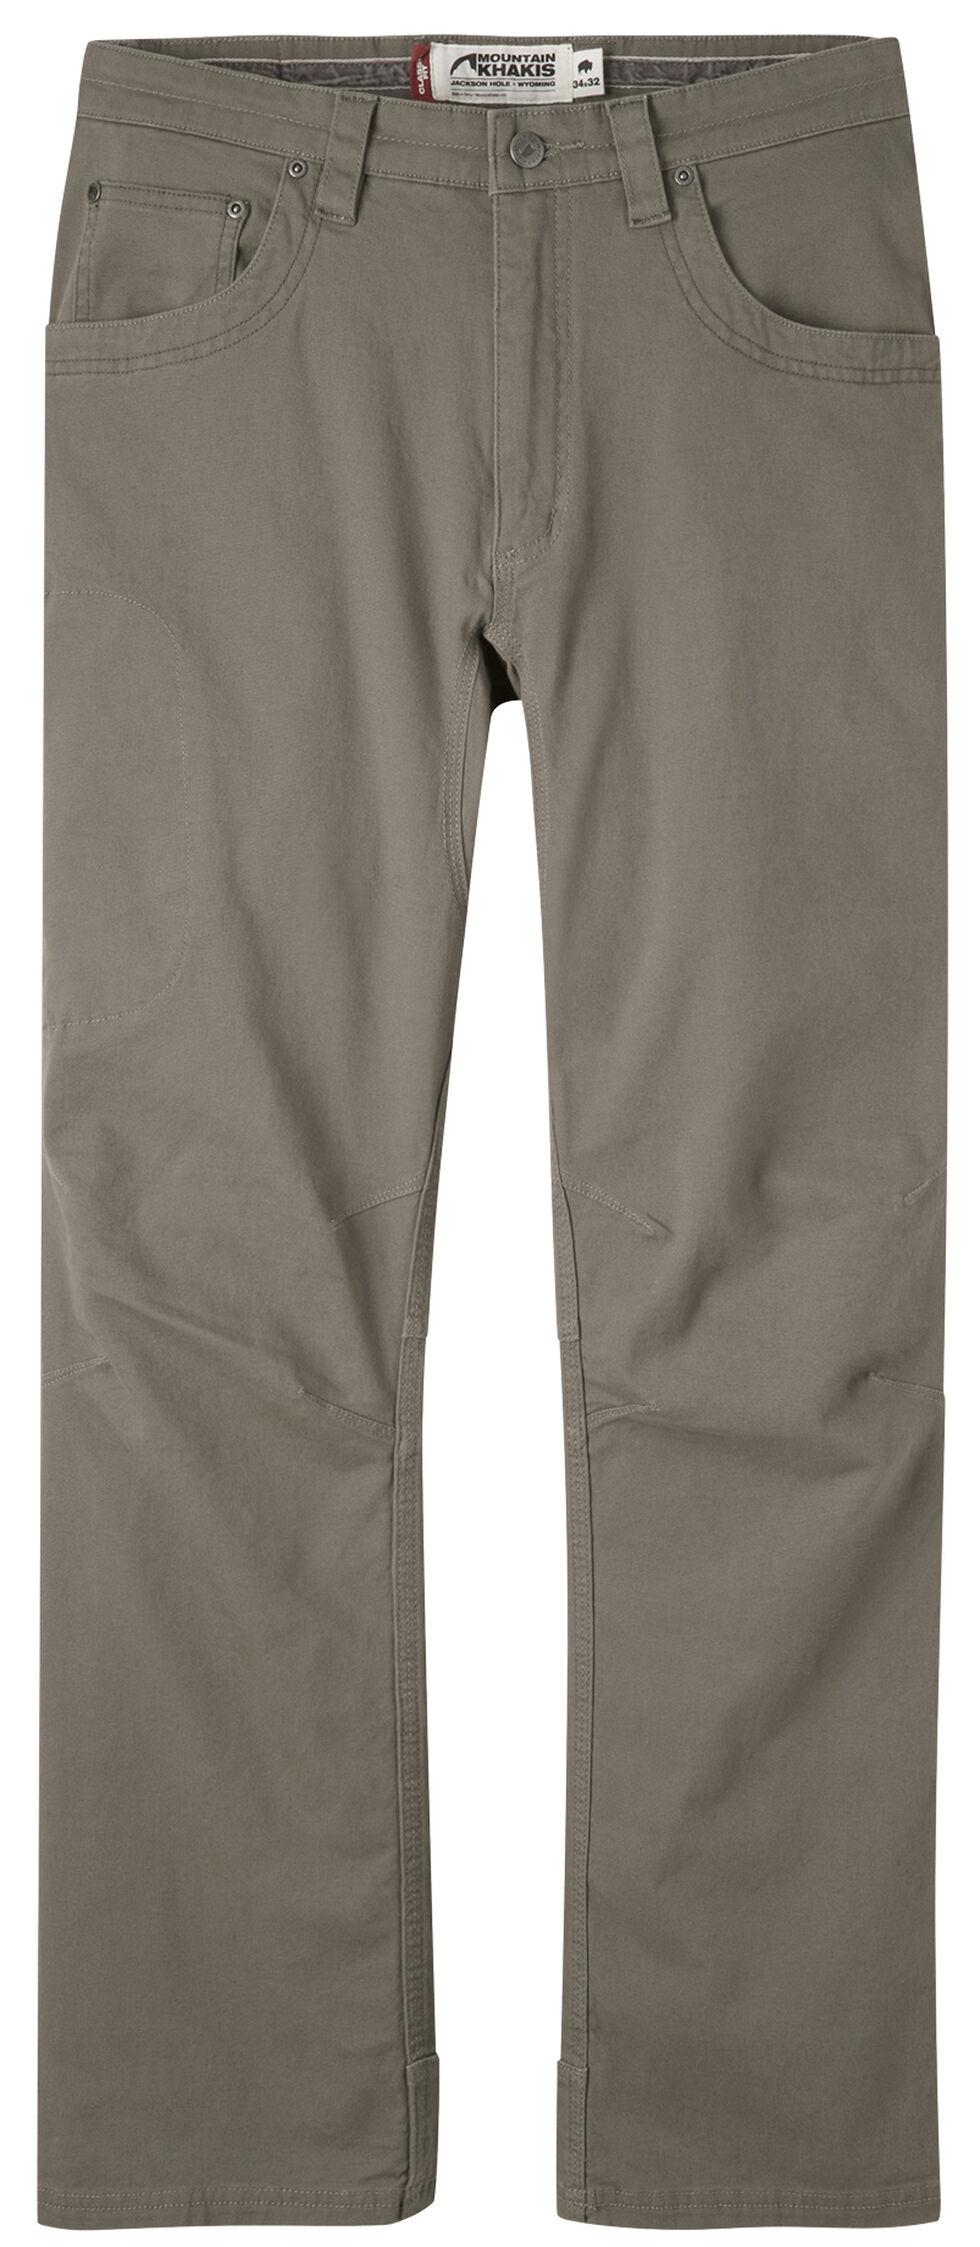 Mountain Khakis Men's Light Brown Camber 106 Pants , Light Brown, hi-res